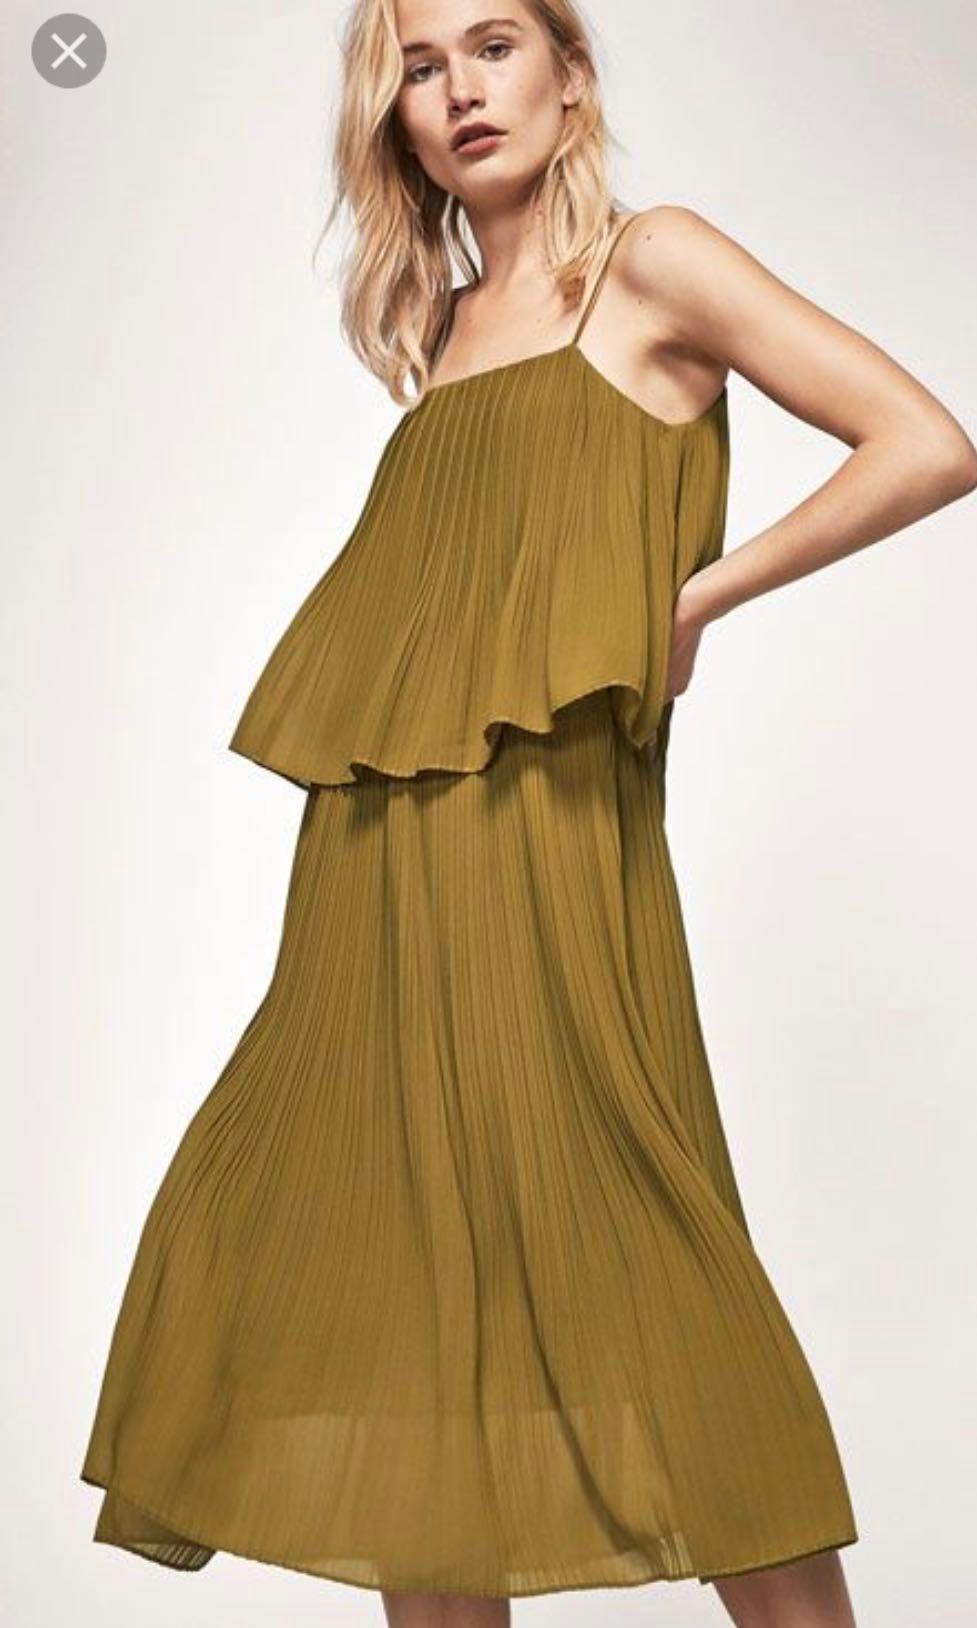 183b19b5184c Massimo Dutti Olive Pleated Dress S US6